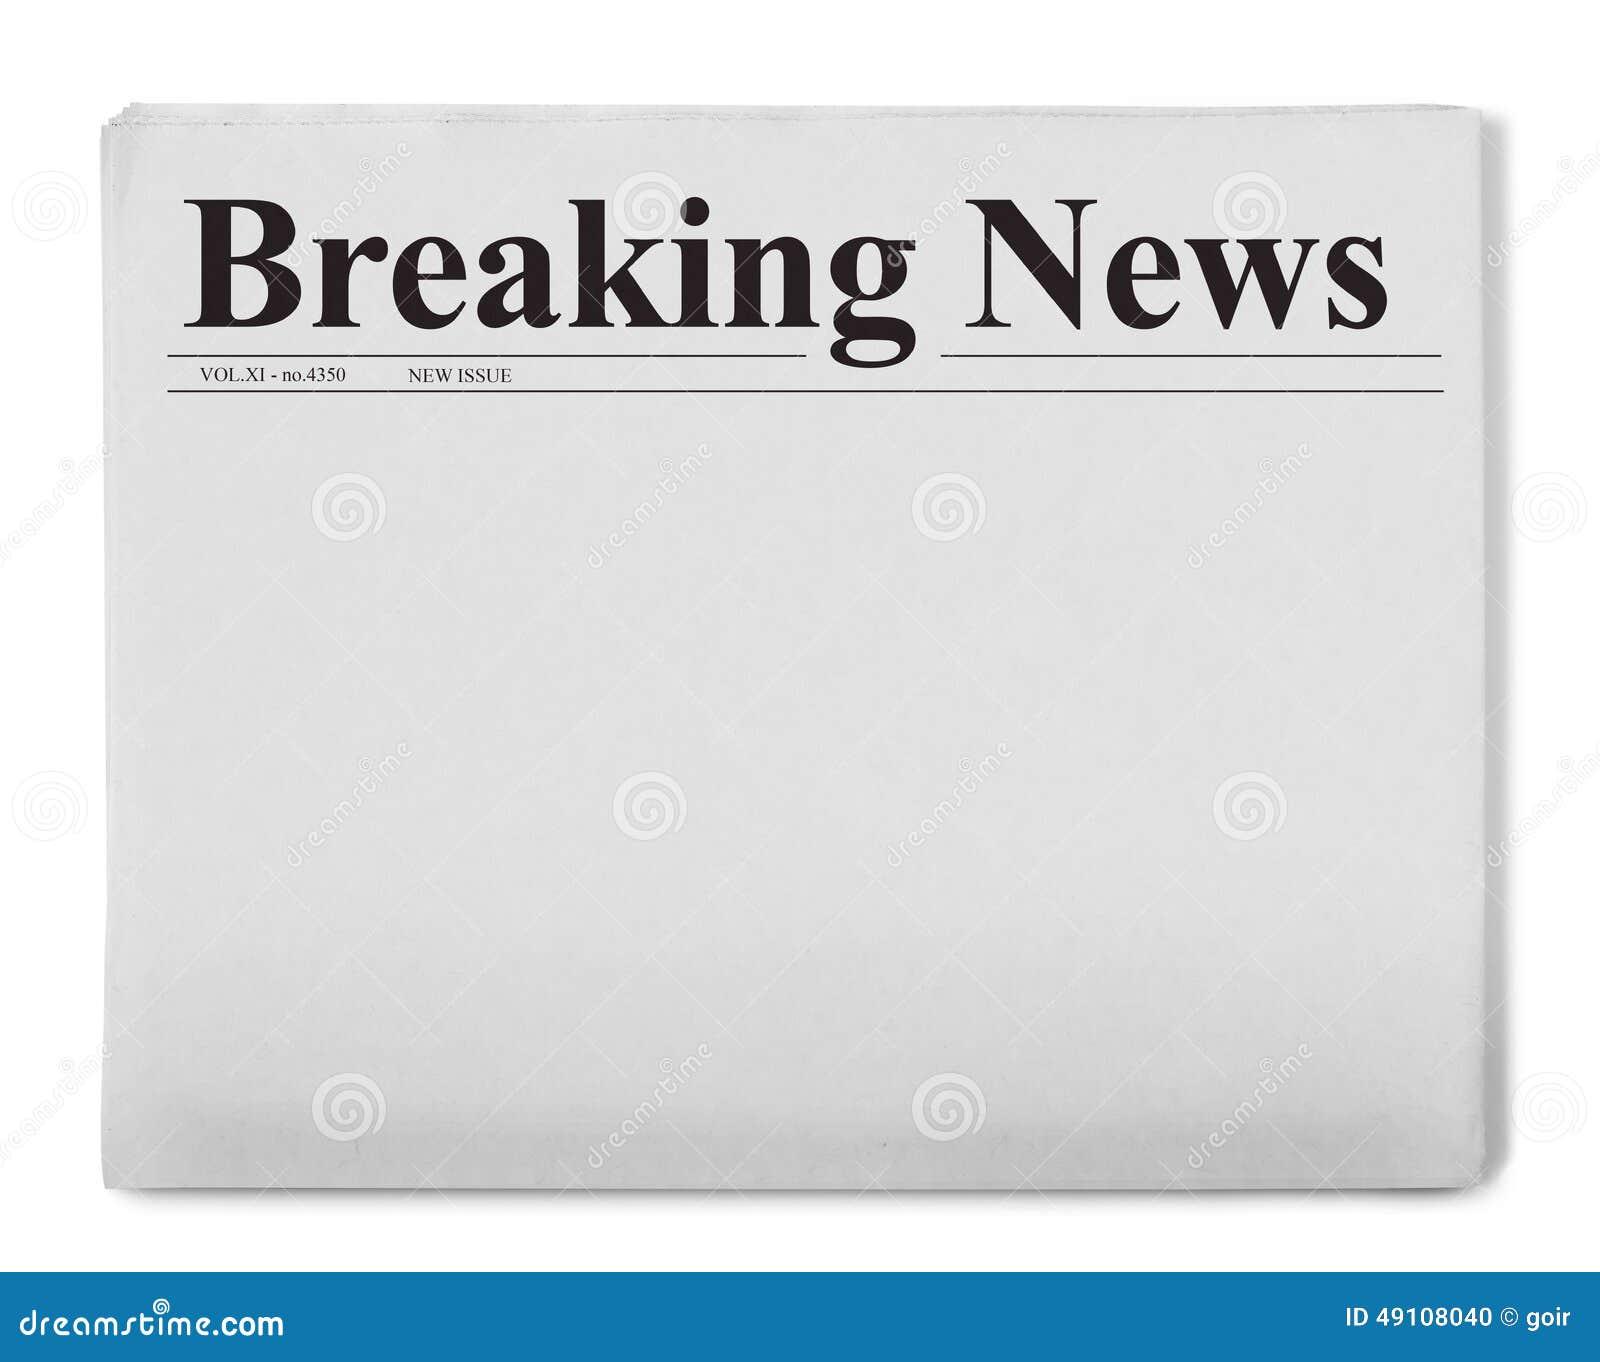 blank folded newspaper stock illustrations blank folded breaking news title on newspaper stock photo